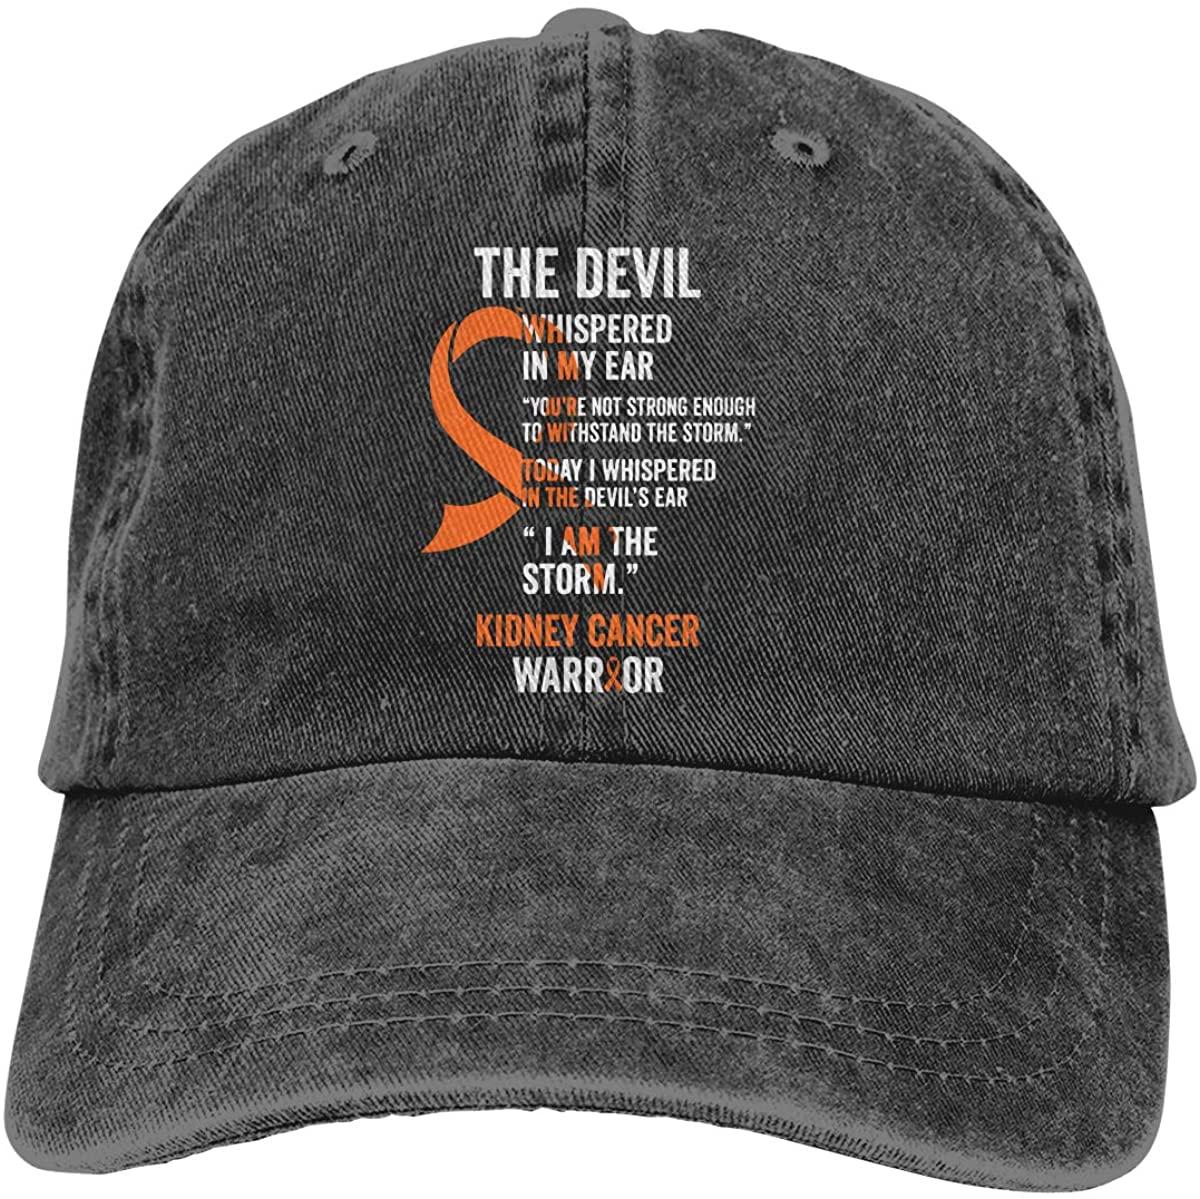 Unisex Kidney Cancer Awareness Vintage Washed Twill Baseball Cap Adjustable Hats Funny Humor Irony Graphics of Adult Gift Black